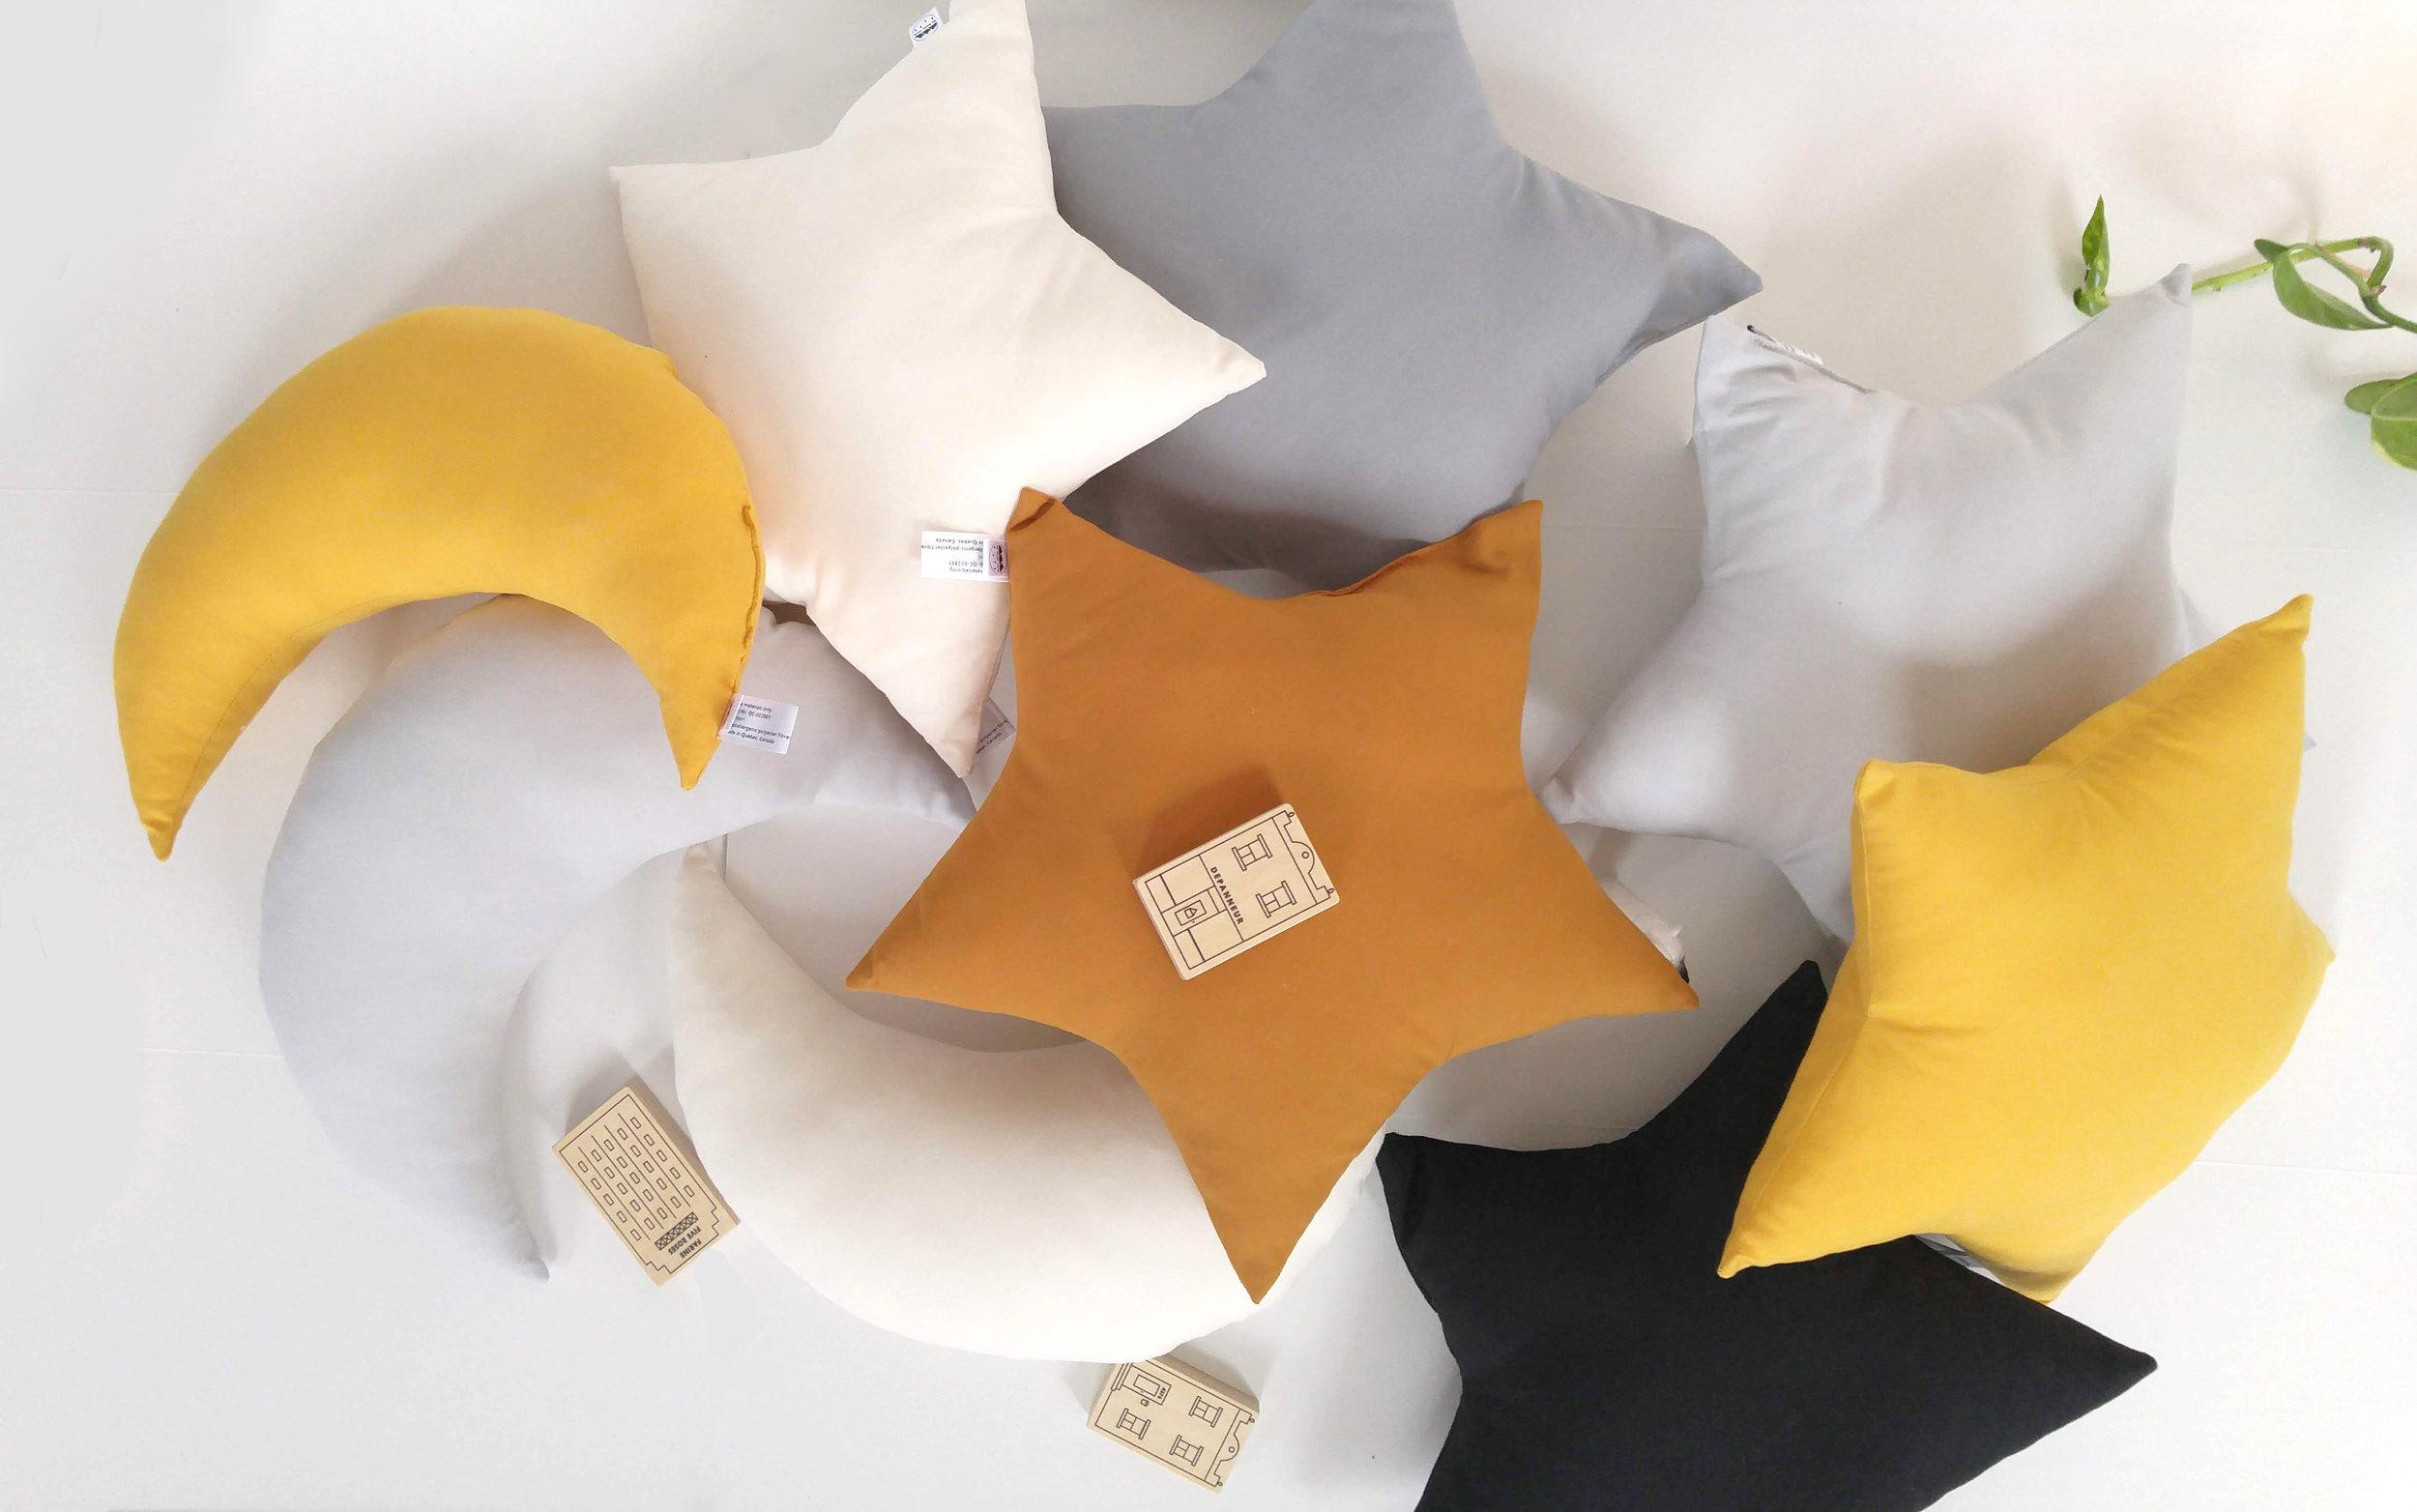 The Butter Flying- New Moon cushion-Star cushion 4.jpg